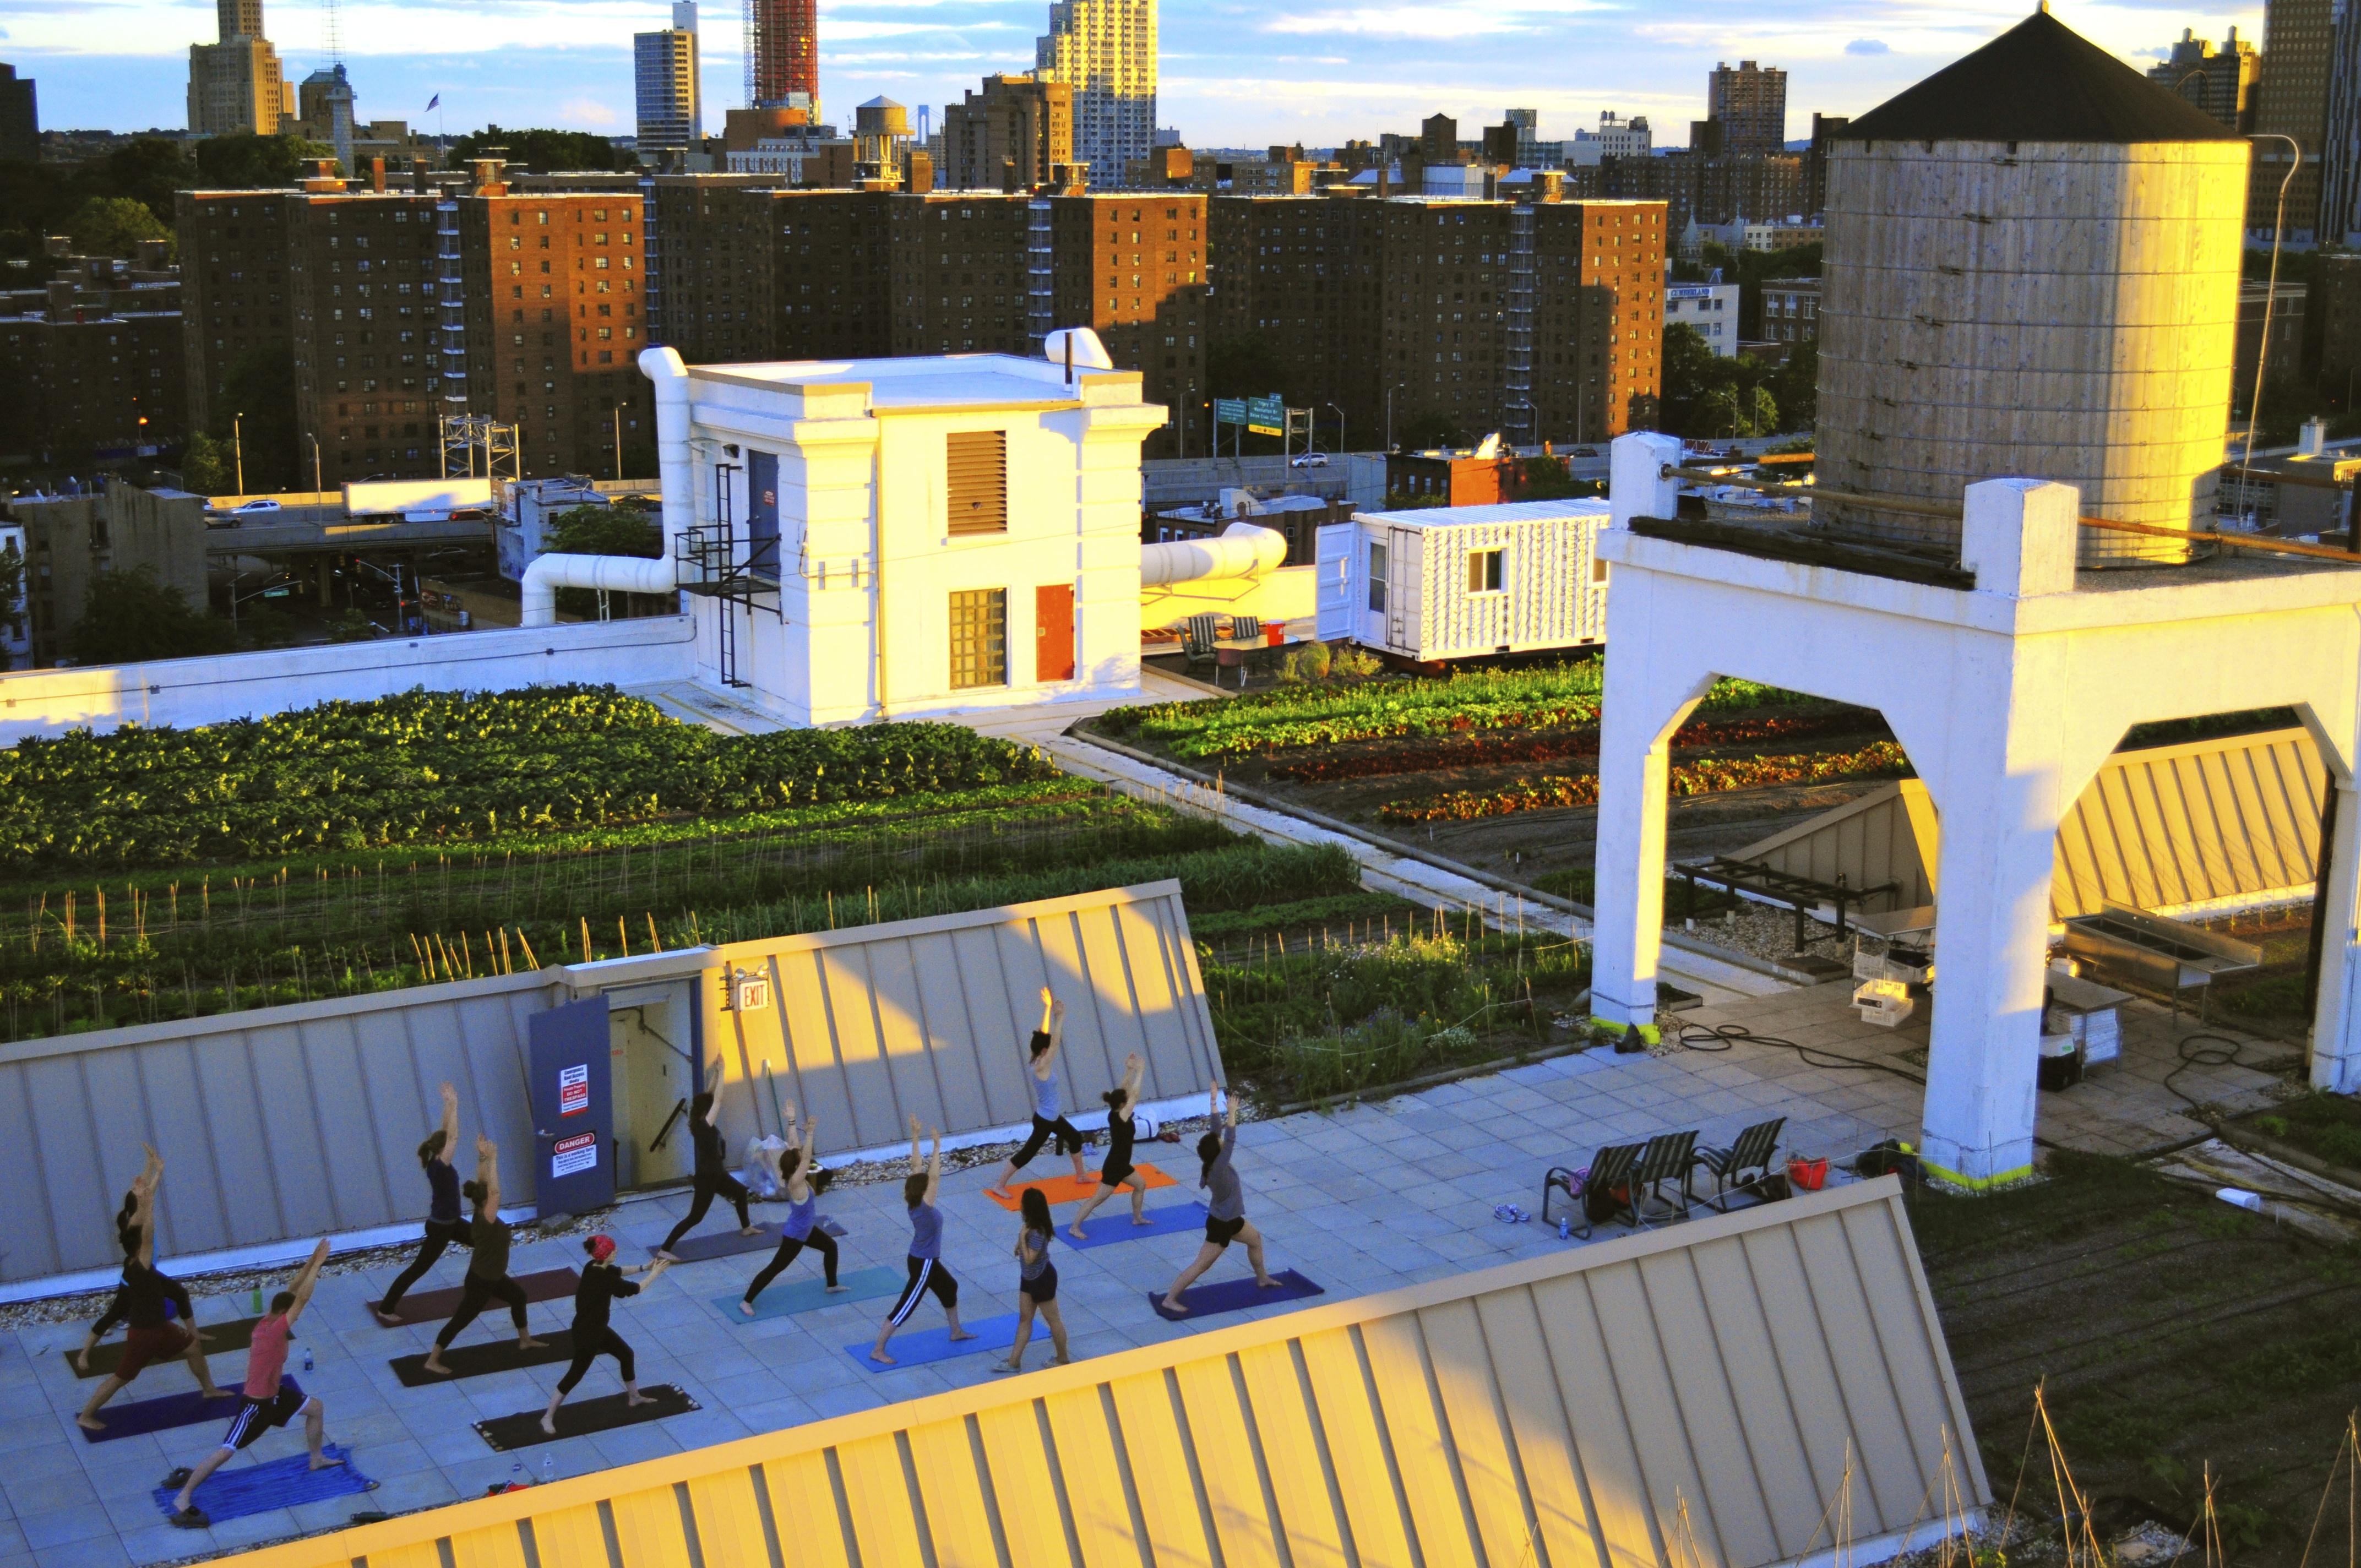 Brooklyn Grange Rooftop Farm Boosts Business Via Events